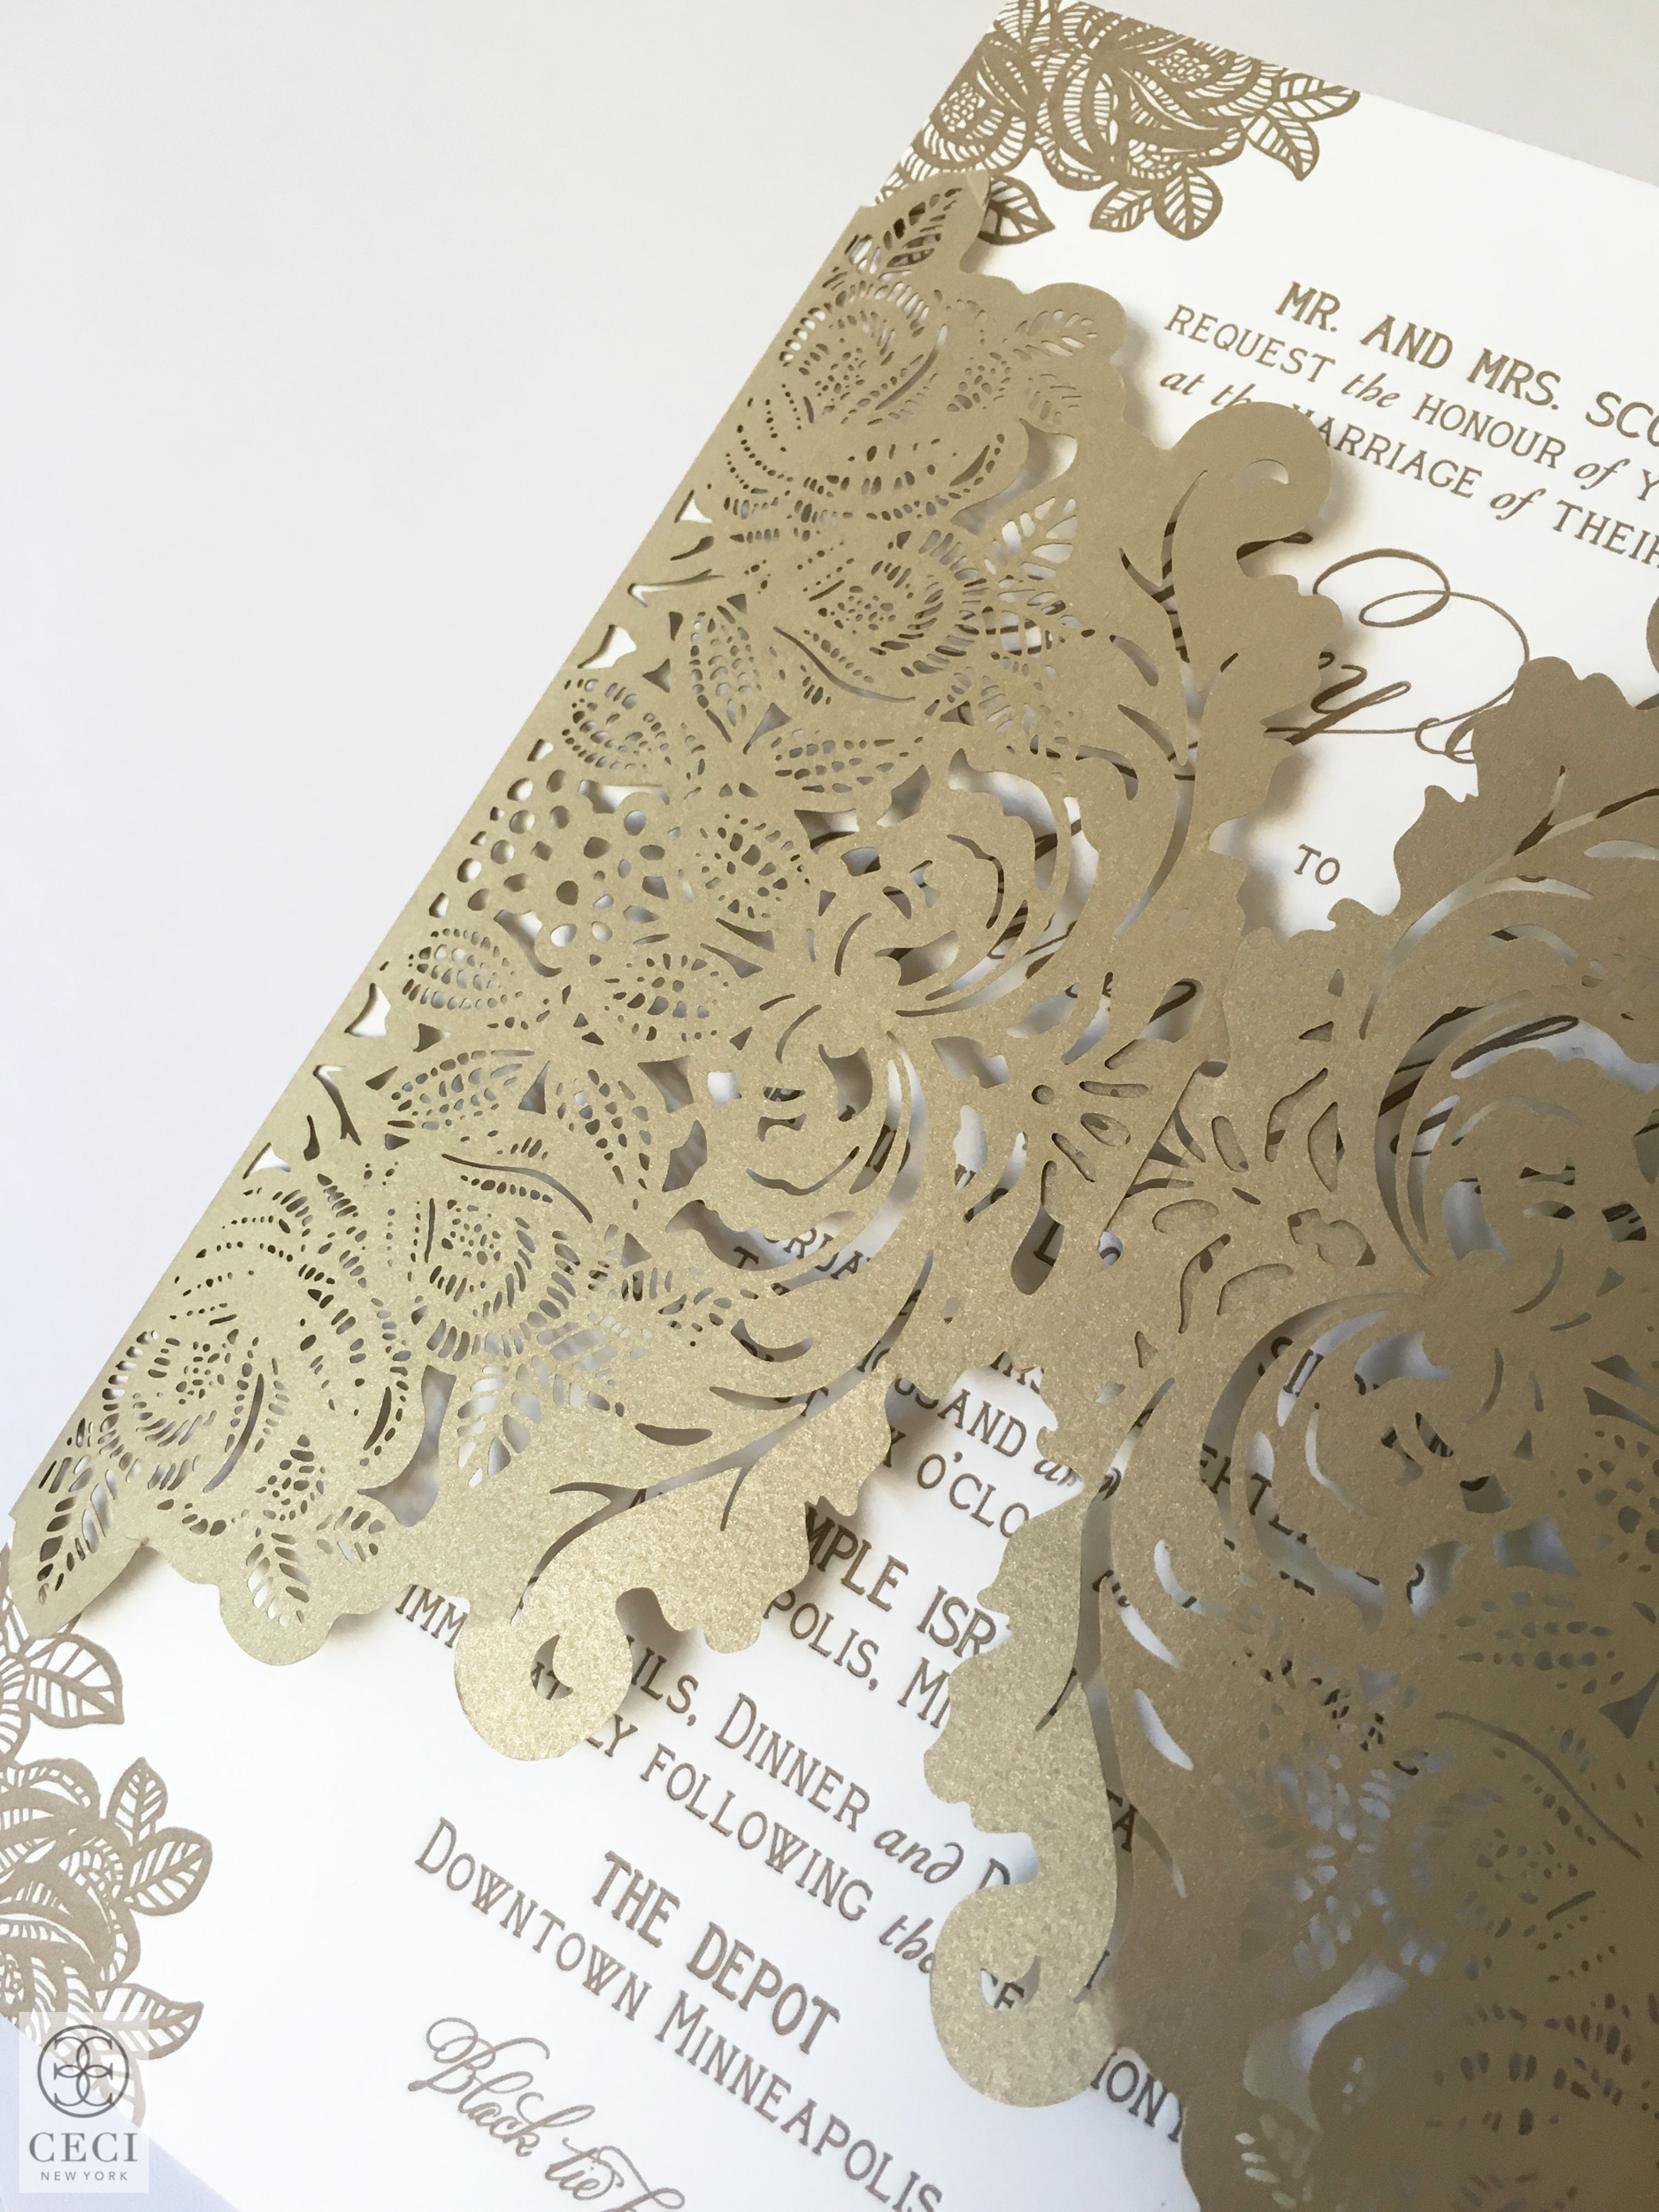 Ceci_New_York_Ceci_Style_Ceci_Johnson_Luxury_Lifestyle_Floral_Lace_Wedding_Letterpress_Inspiration_Design_Custom_Couture_Personalized_Invitations_-13.jpg